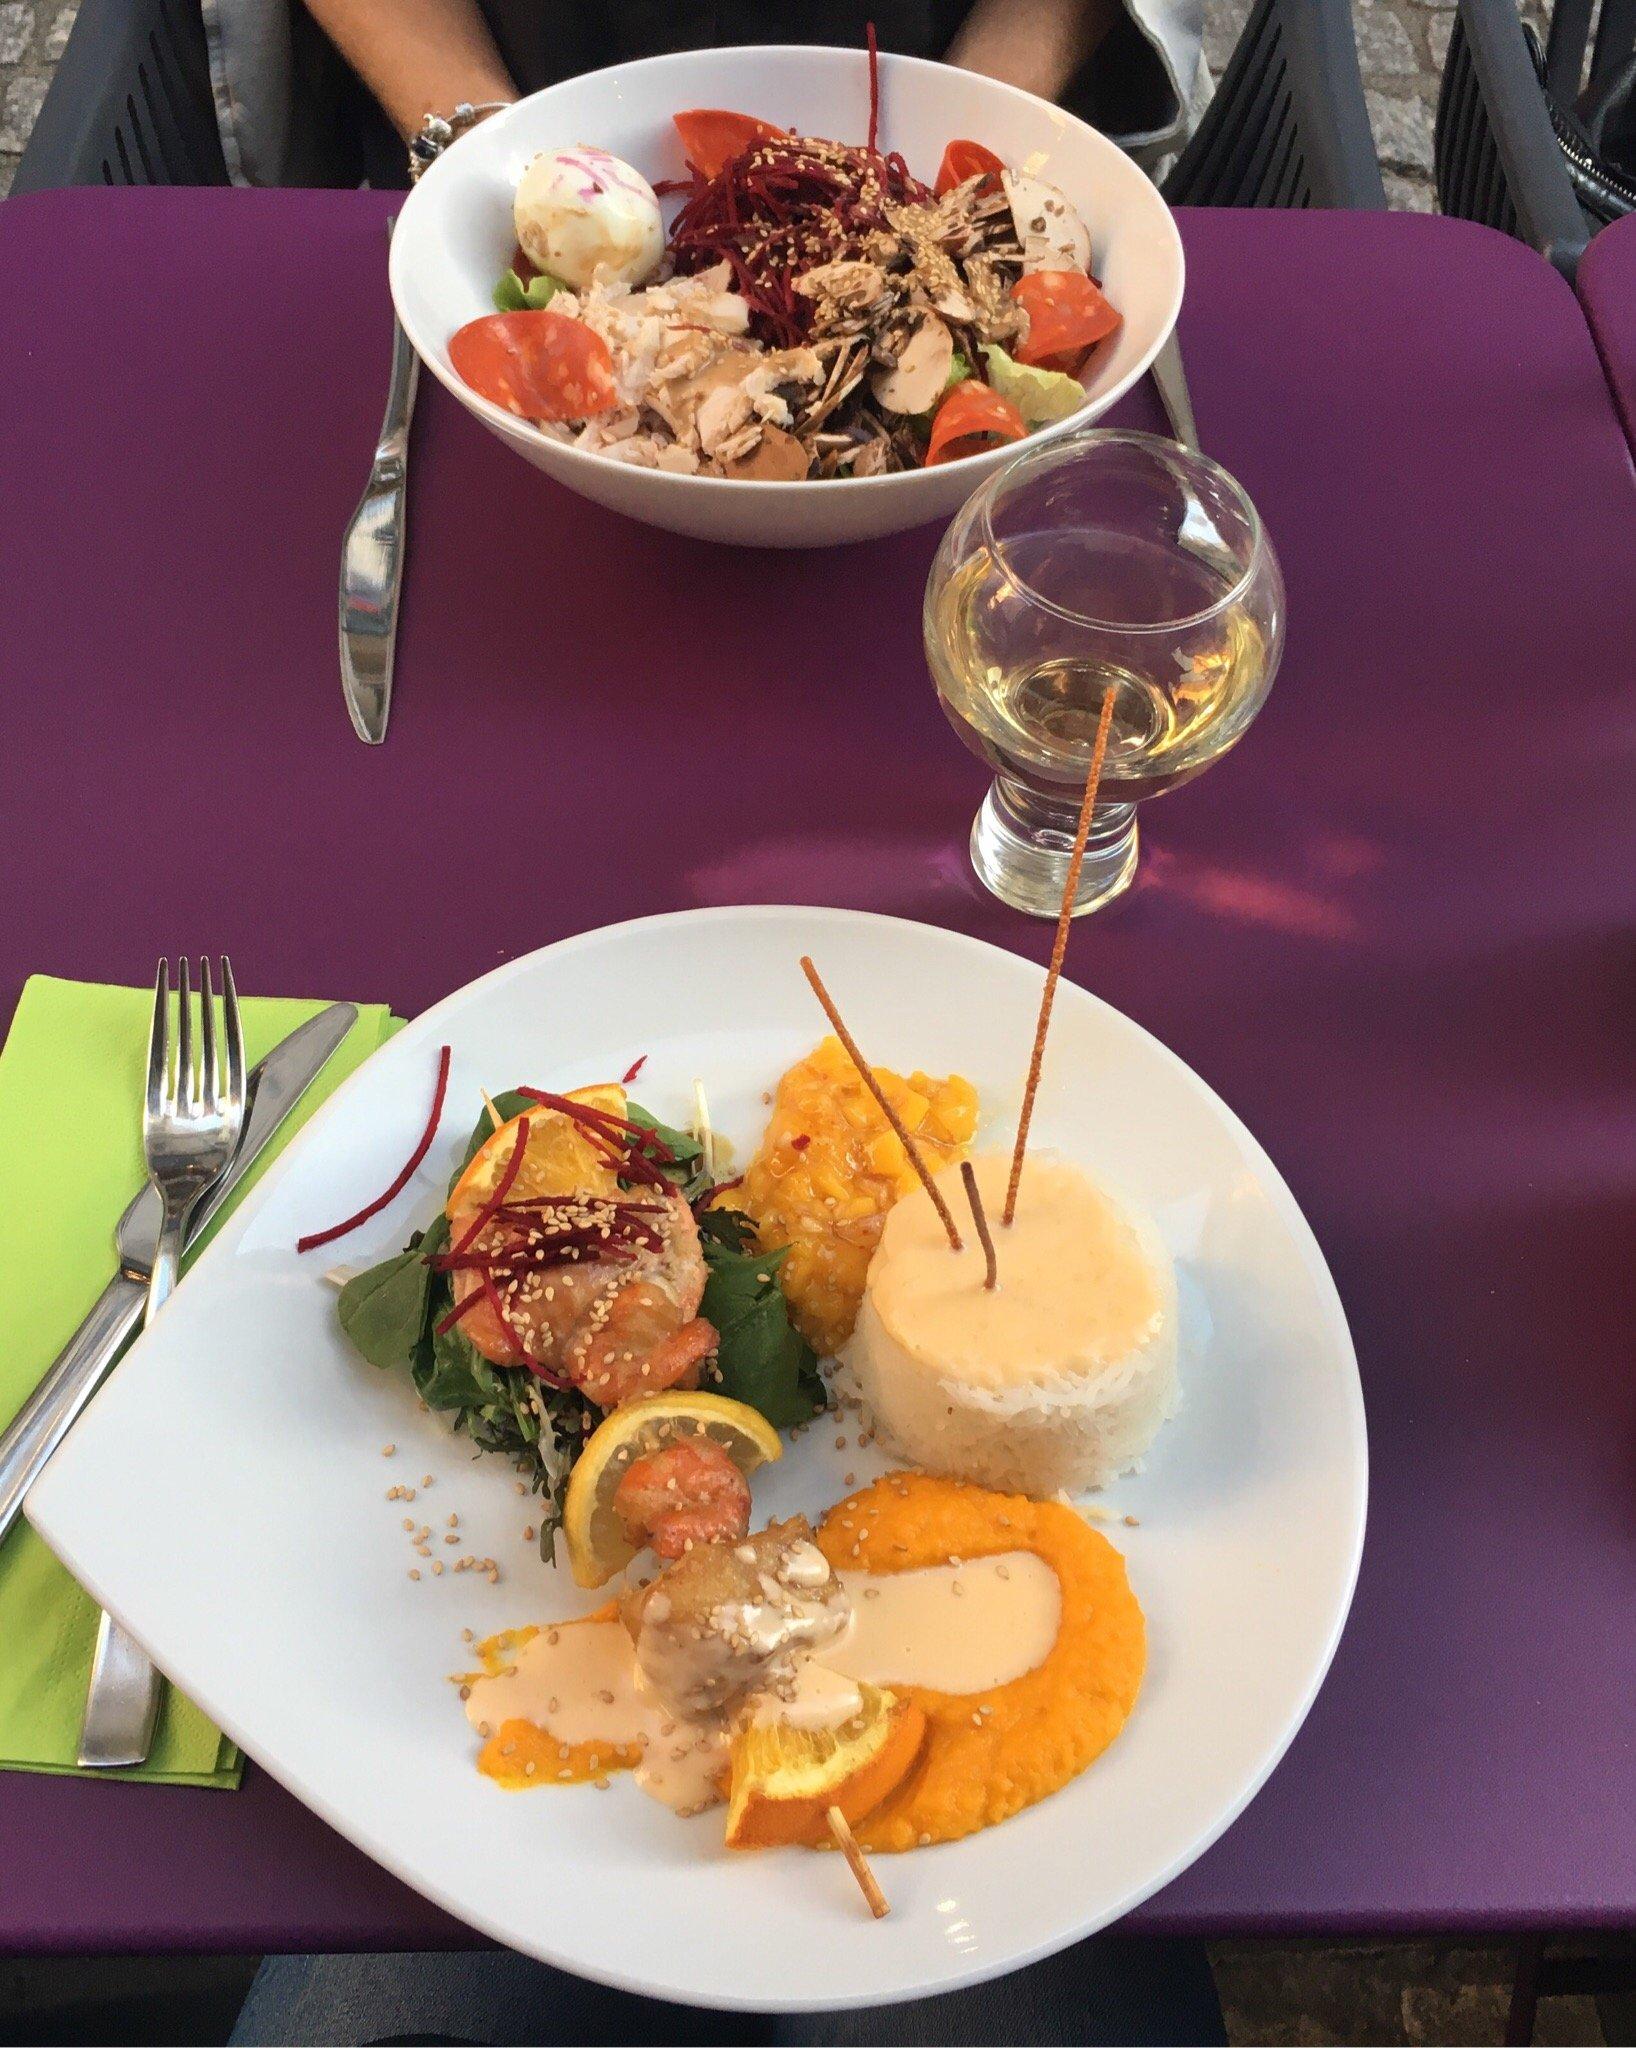 Restaurant au jardin tripadvisor for Au jardin review